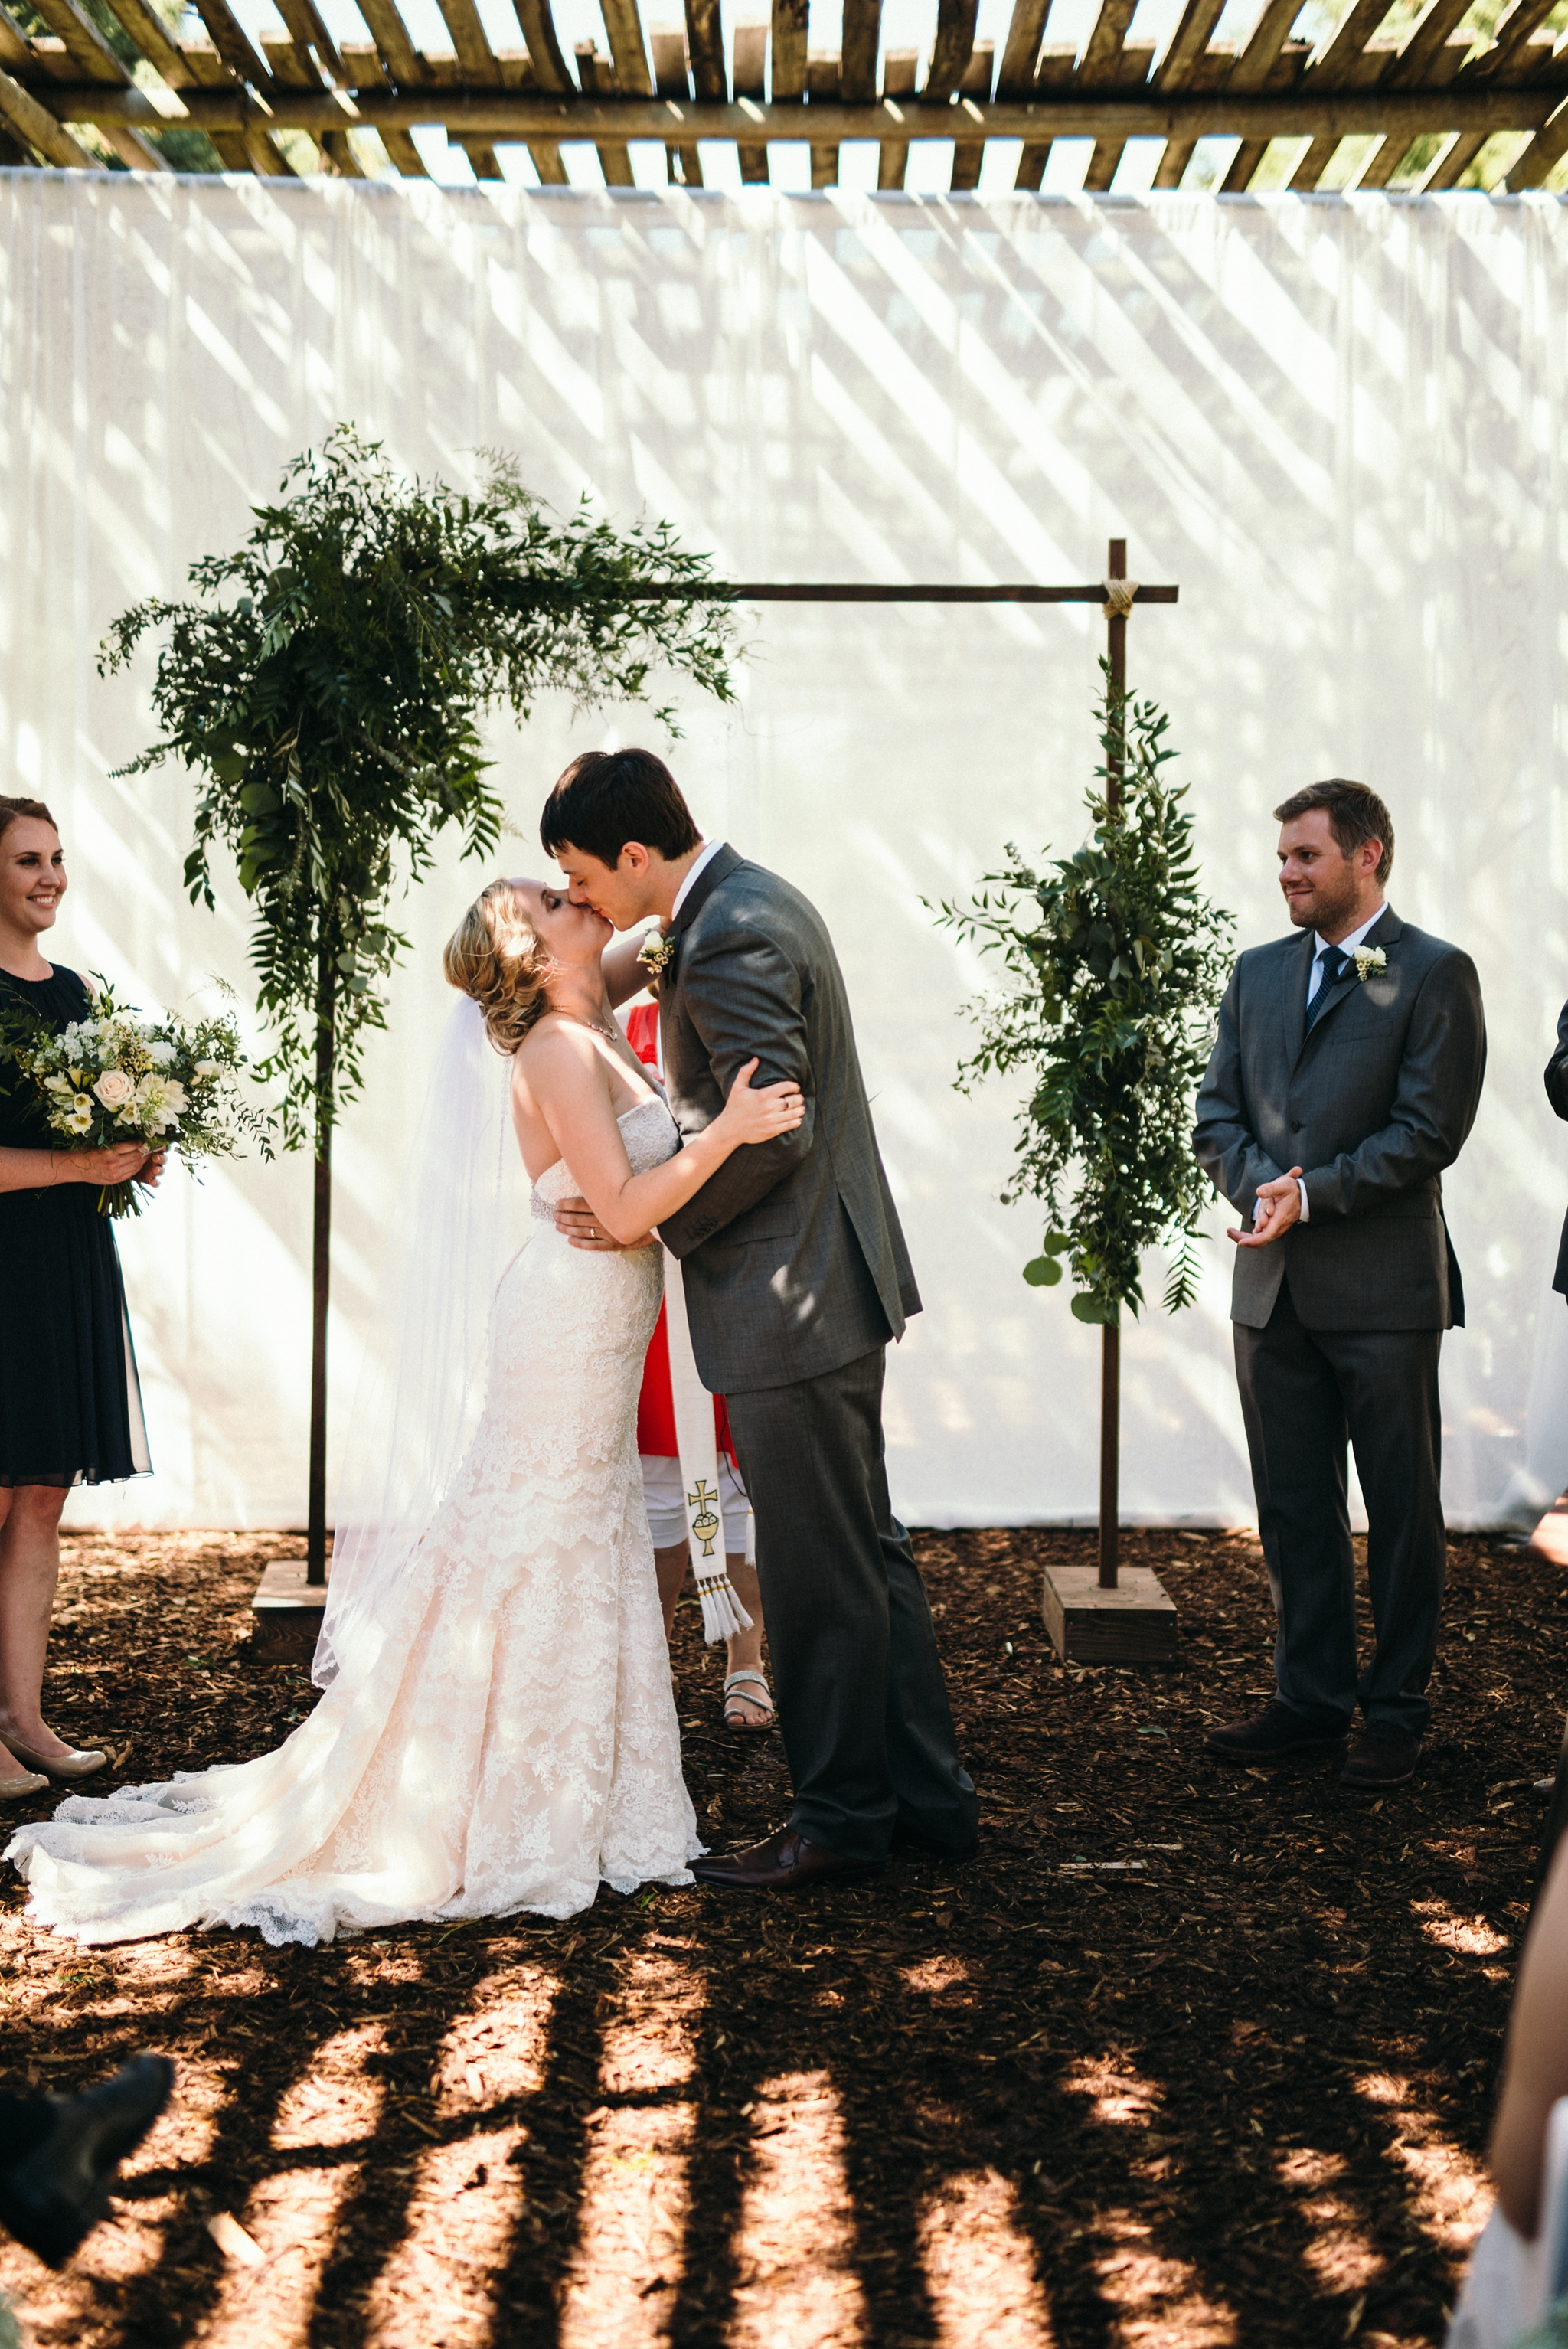 kaihla_tonai_intimate_wedding_elopement_photographer_4358